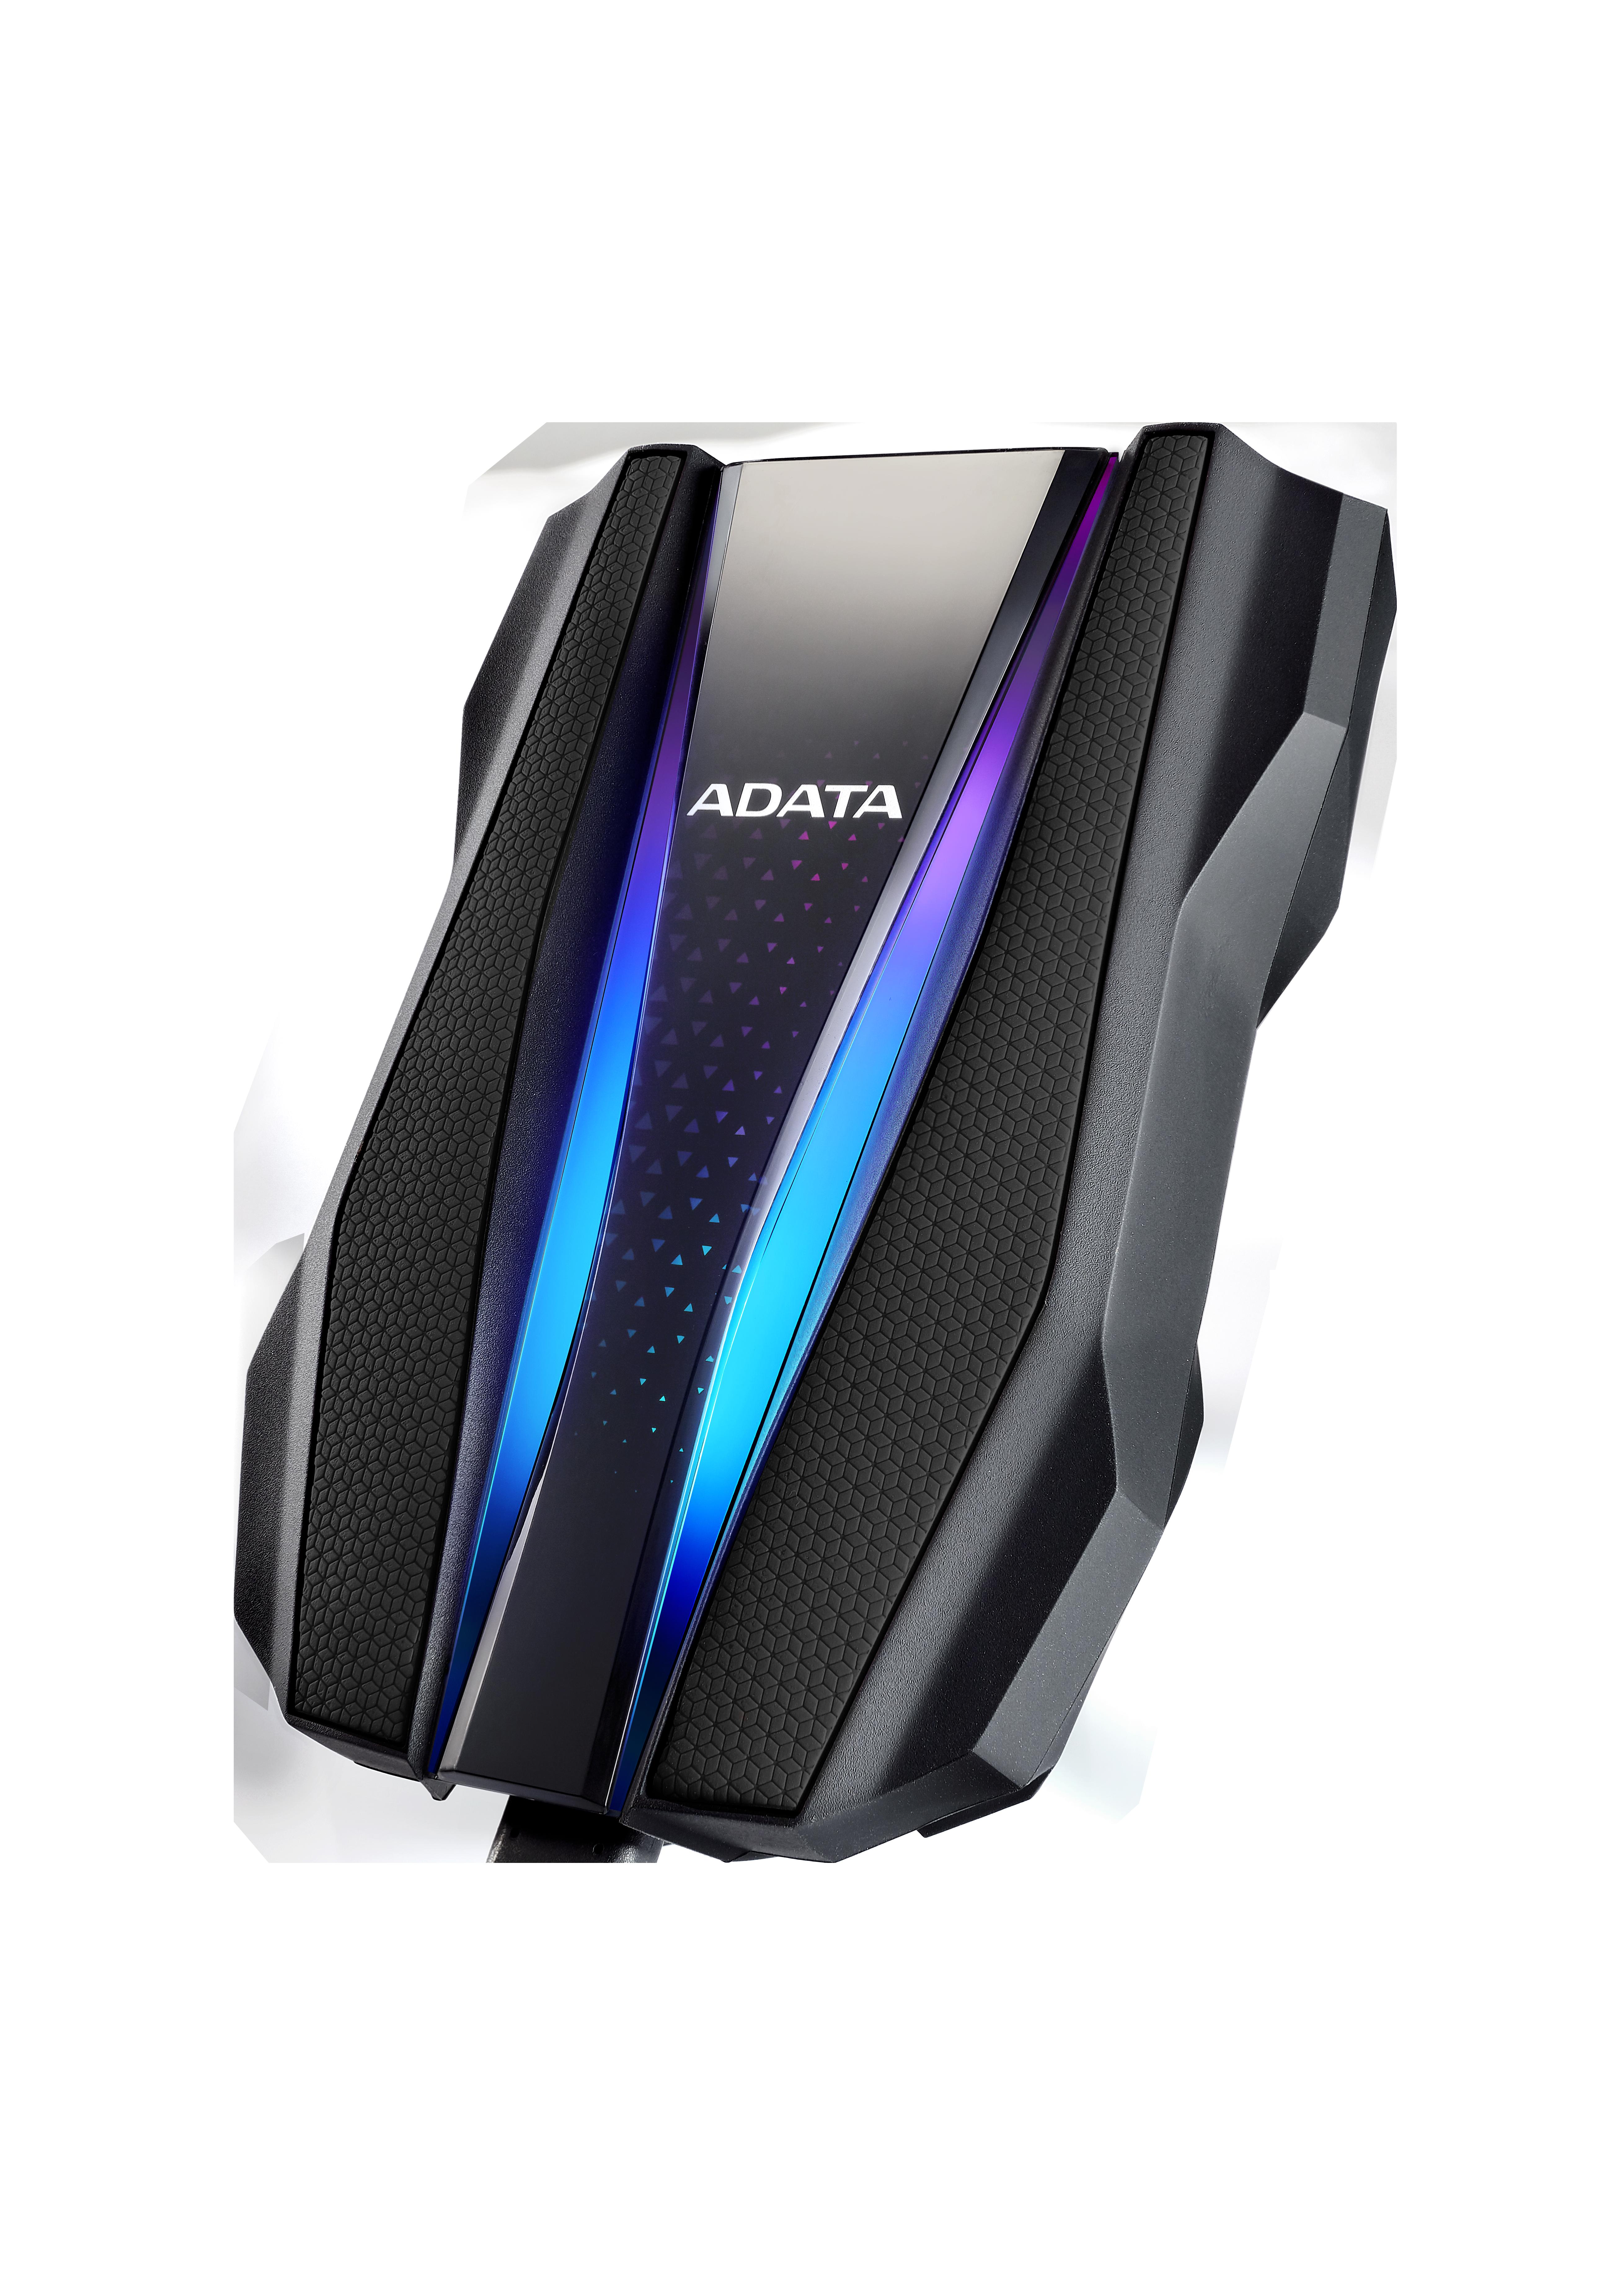 "HDD ADATA EXTERN 2.5"" USB 3.2 Gen1 1TB HD770G, iluminare RGB, Black ""AHD770G-1TU32G1-CBK"" (include TV 0.15 lei) [2]"